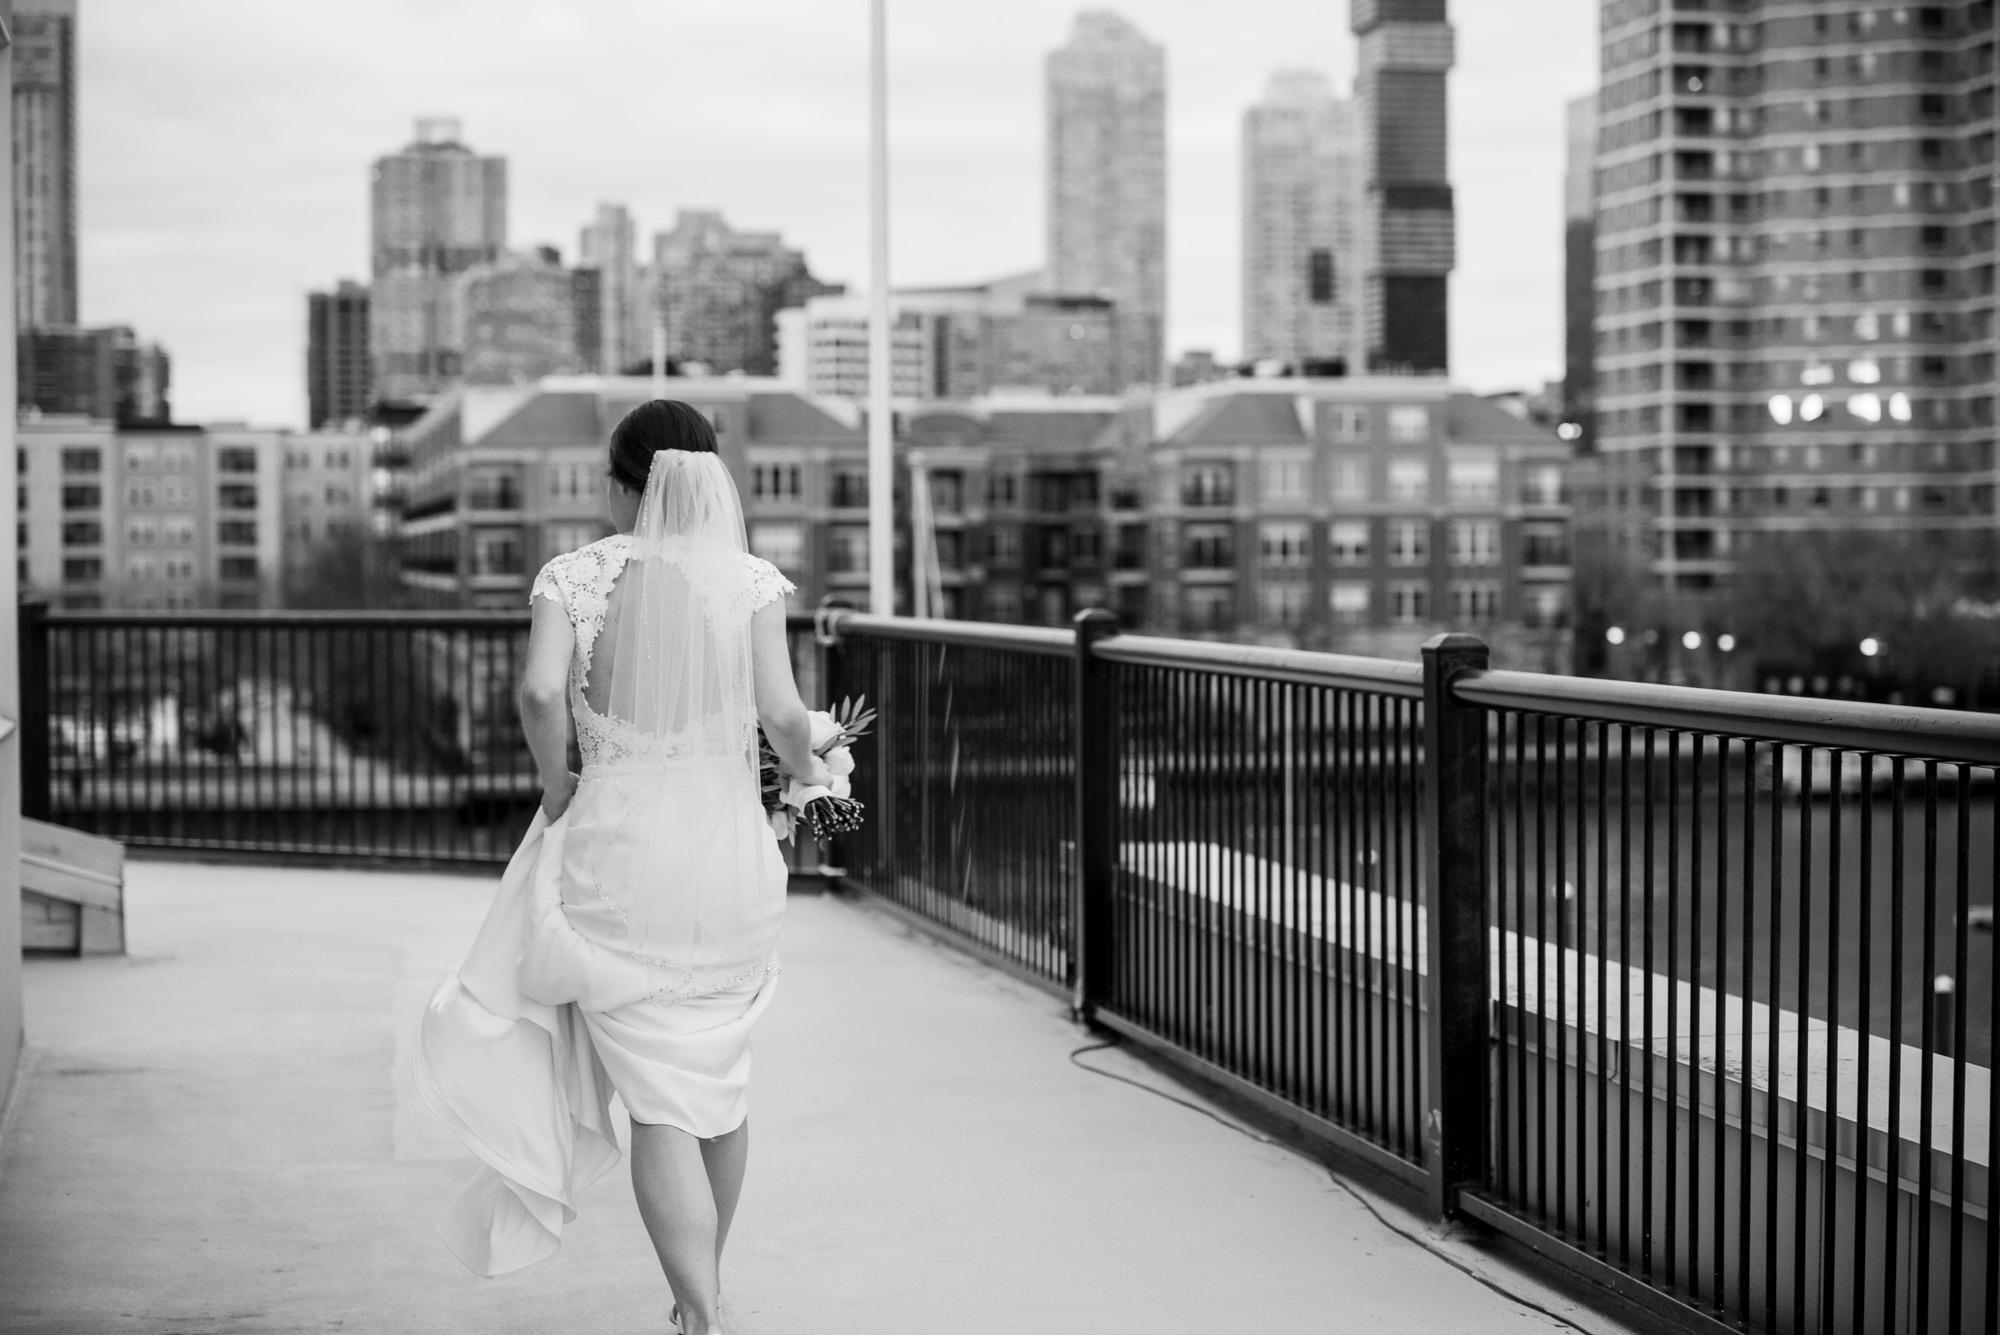 nj-wedding-photographer-maritime-parc-maria-david-36.jpg